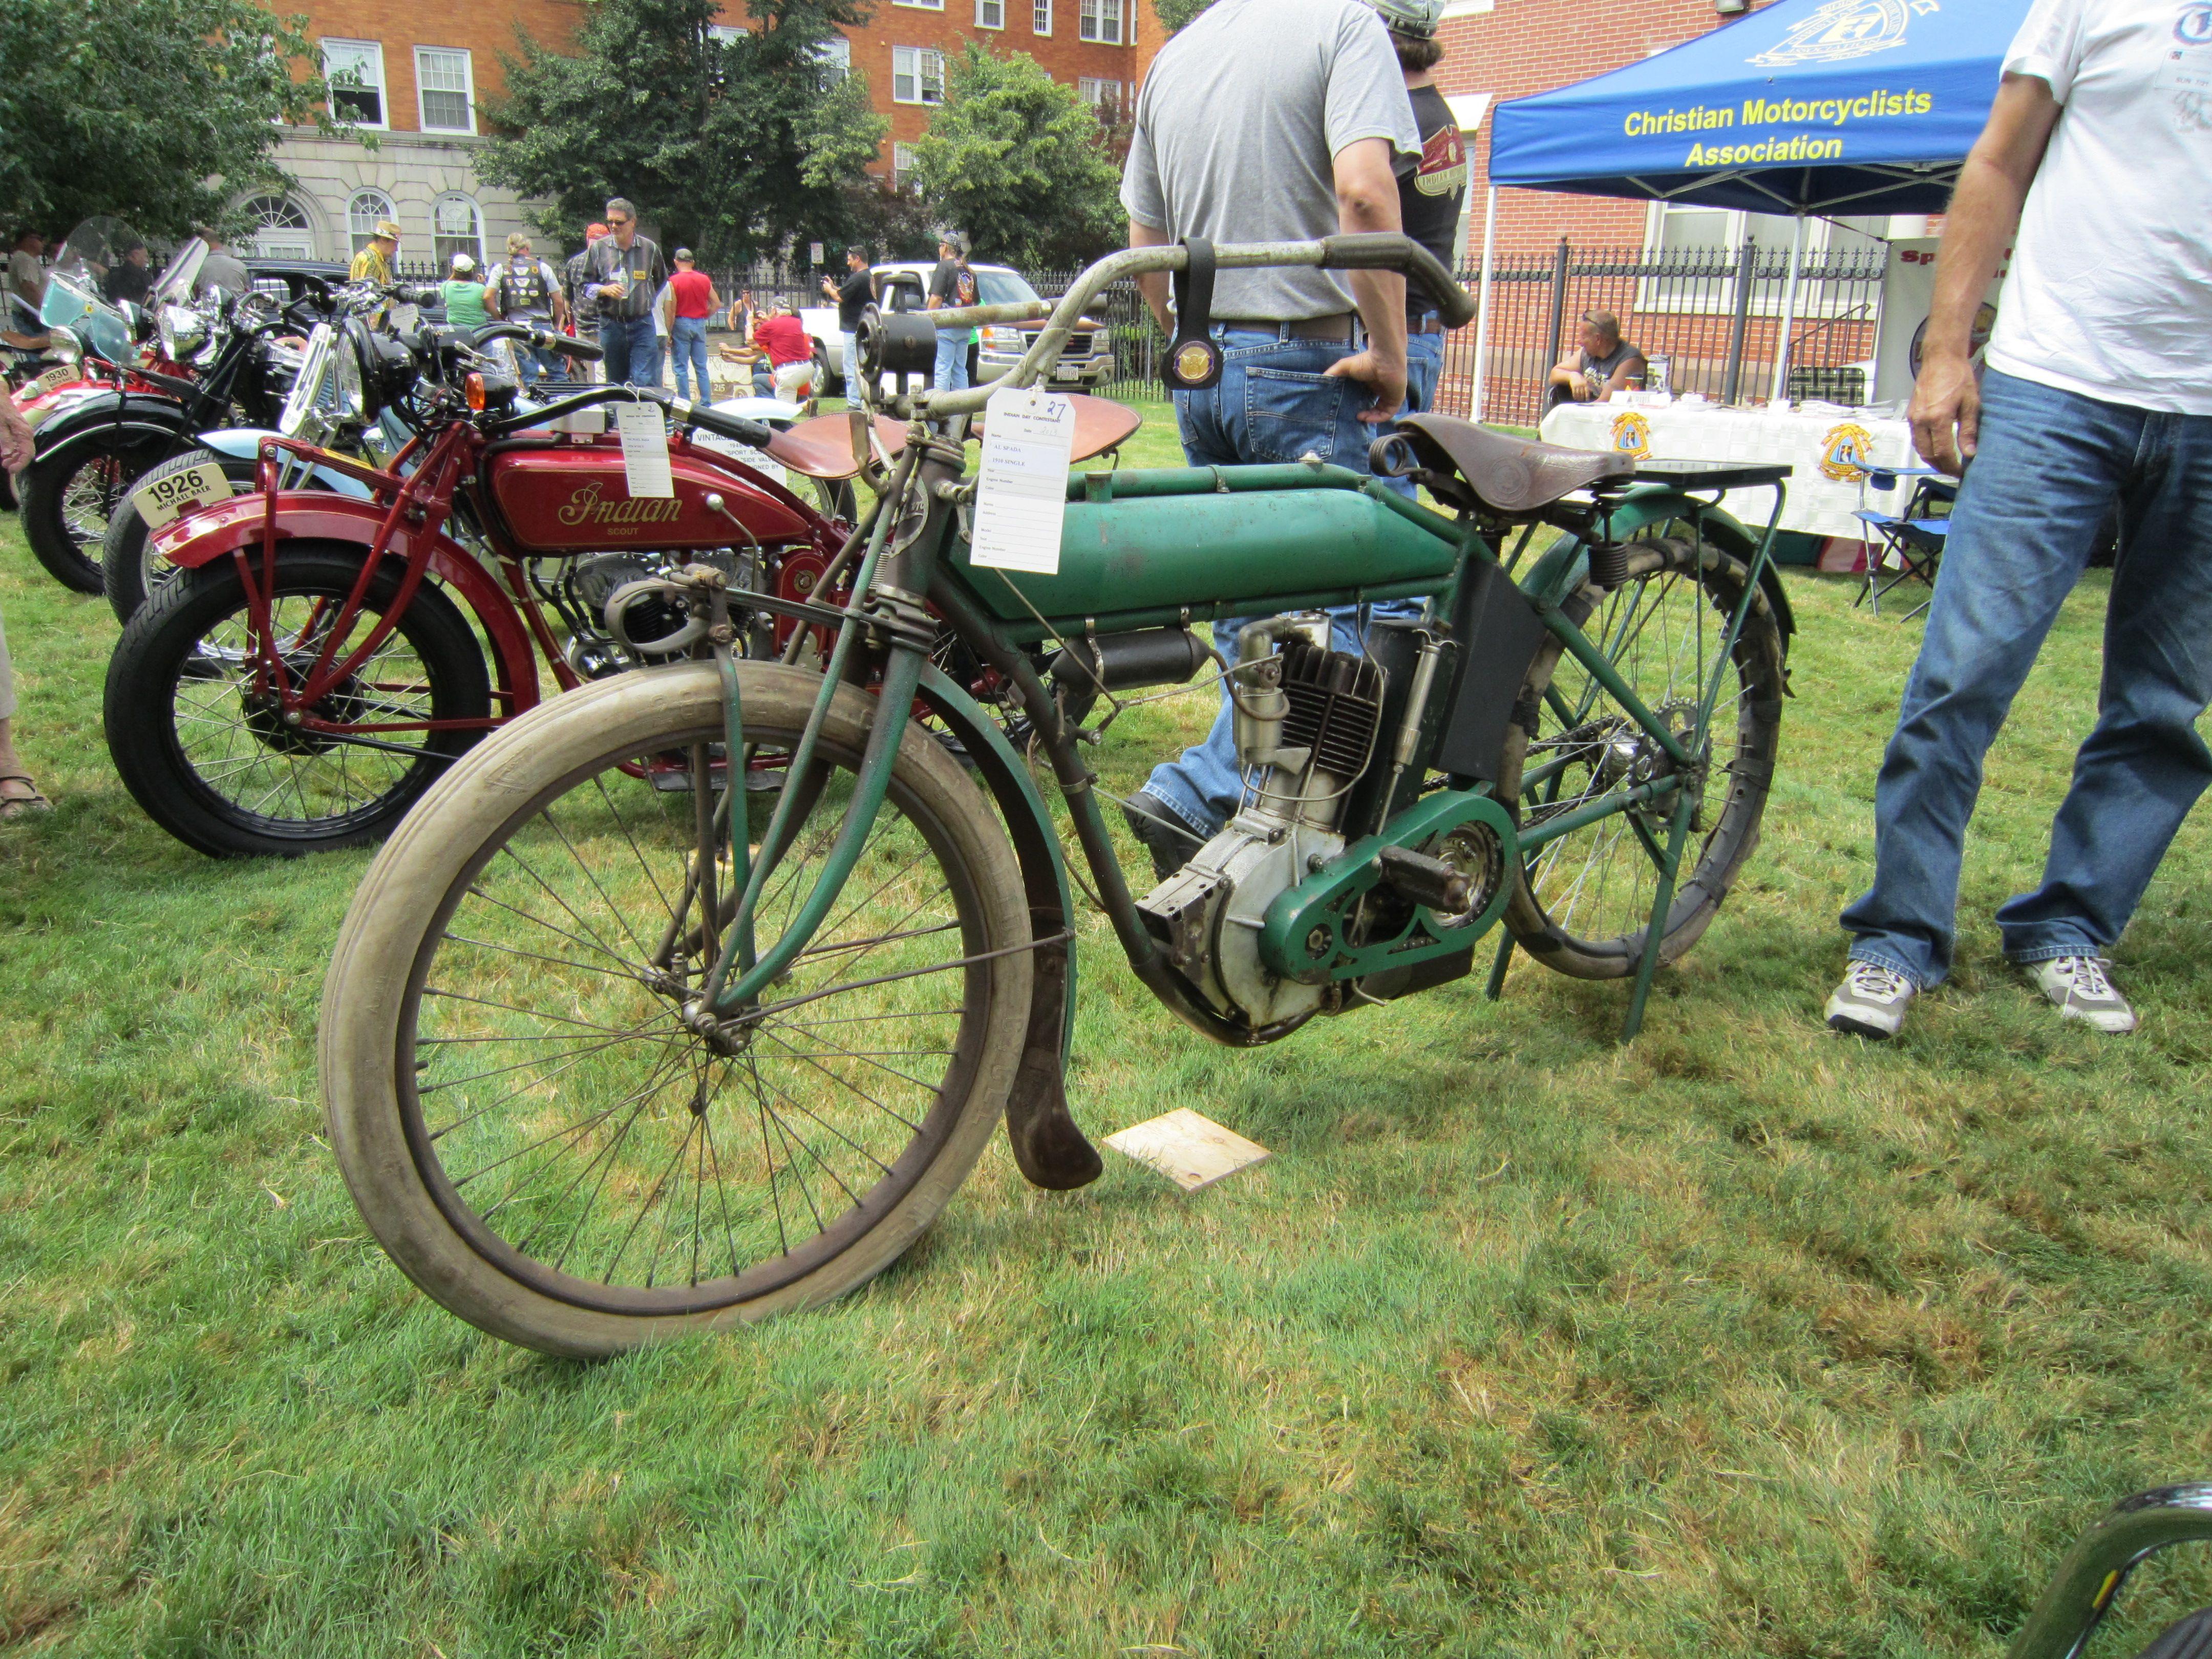 1910 Indian Single Indian Motocycle Day July 21 2013 Indian Motorcycle Vintage Indian Motorcycles Old School Bike